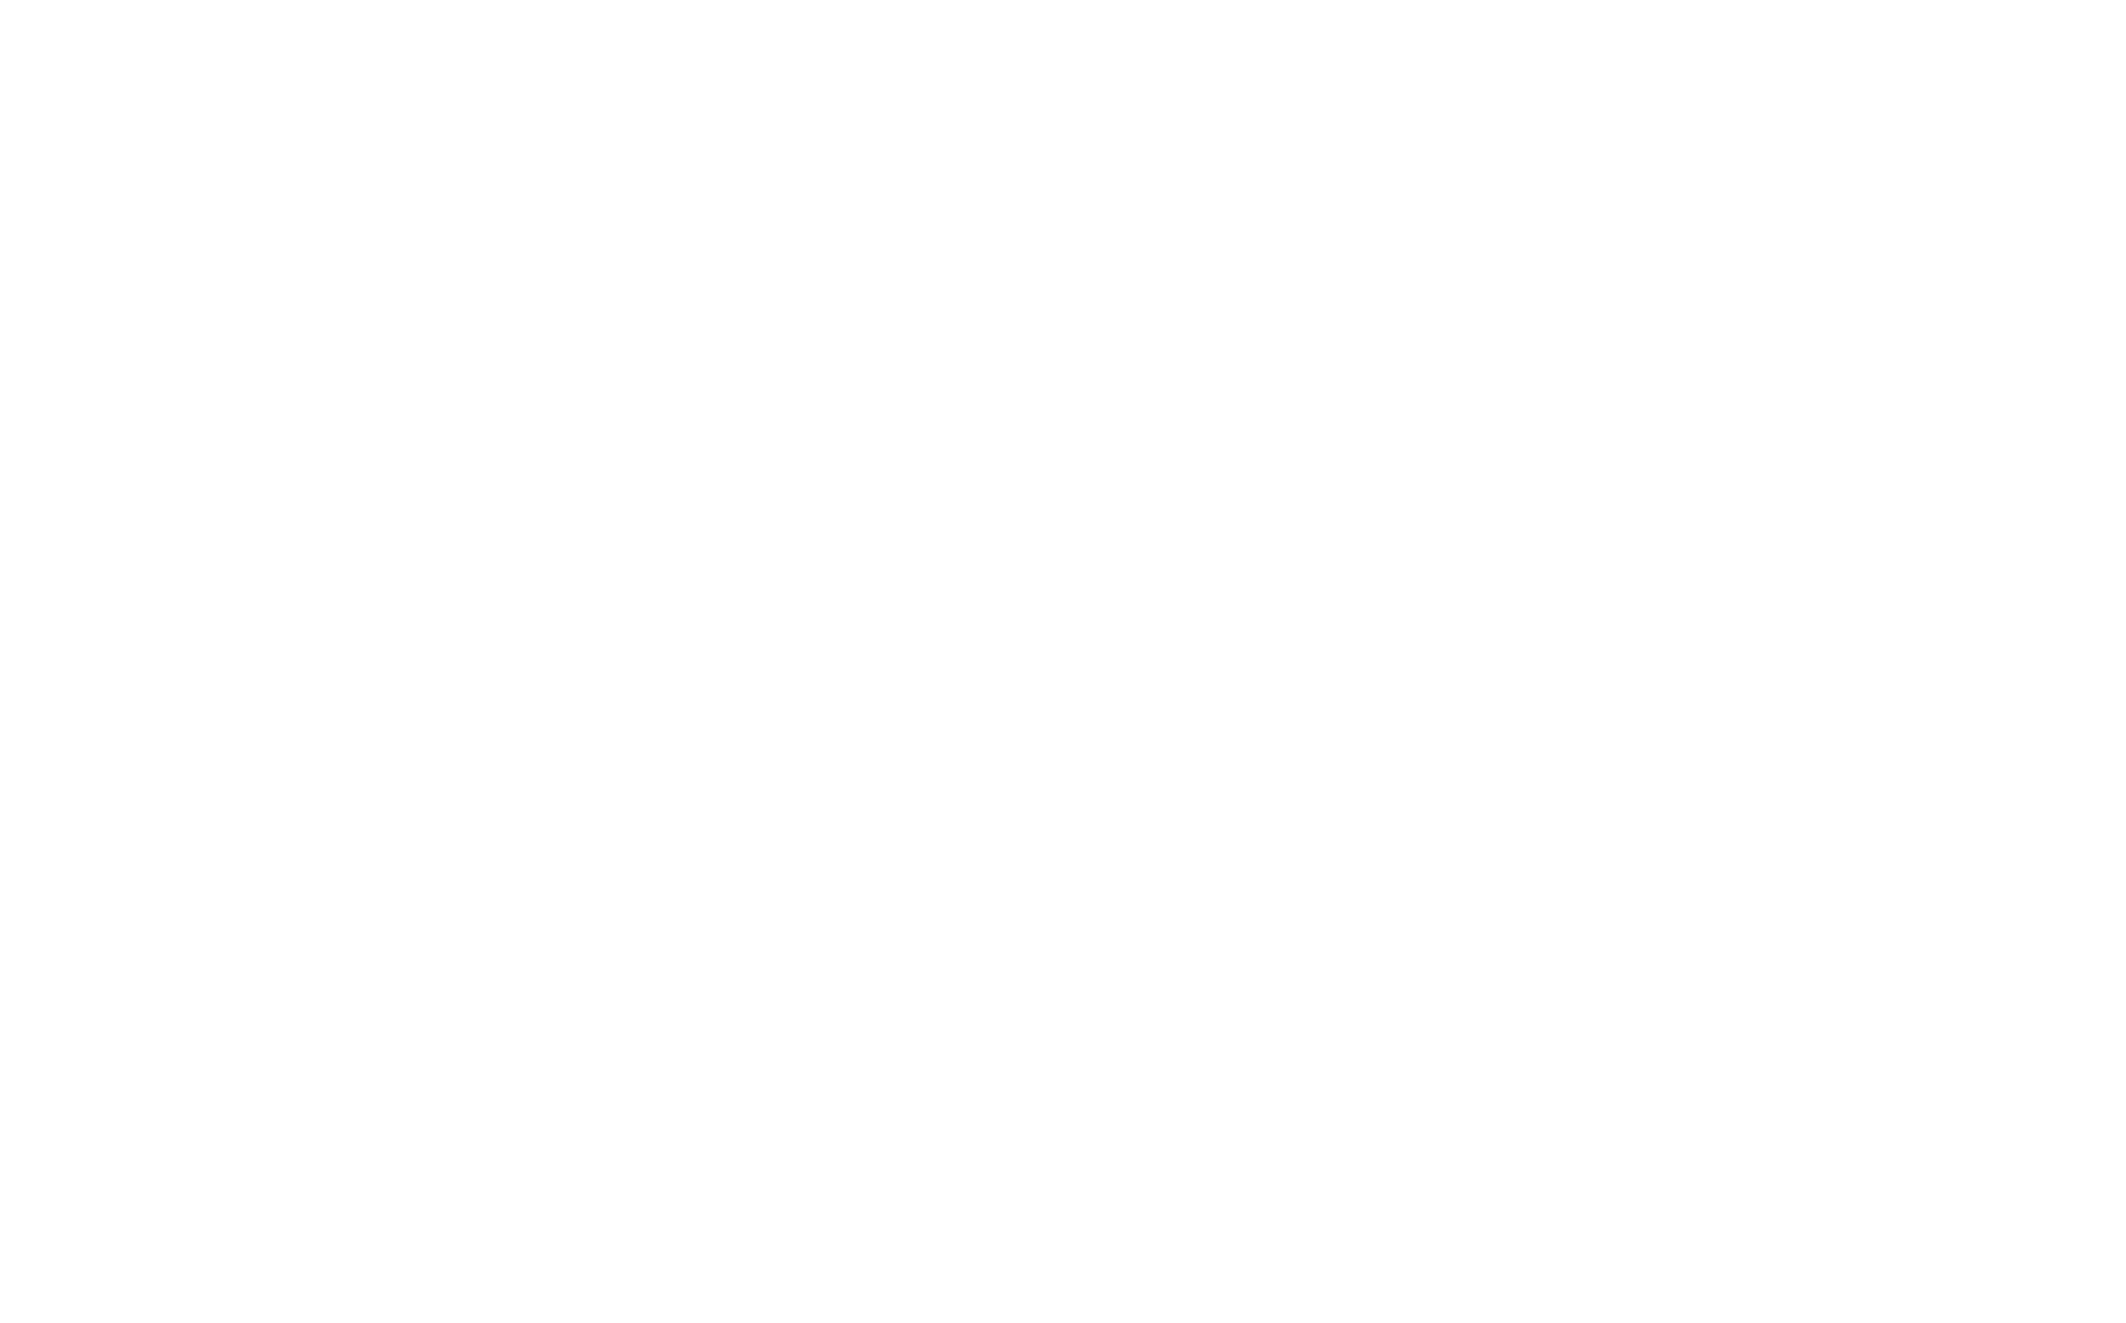 whitemap